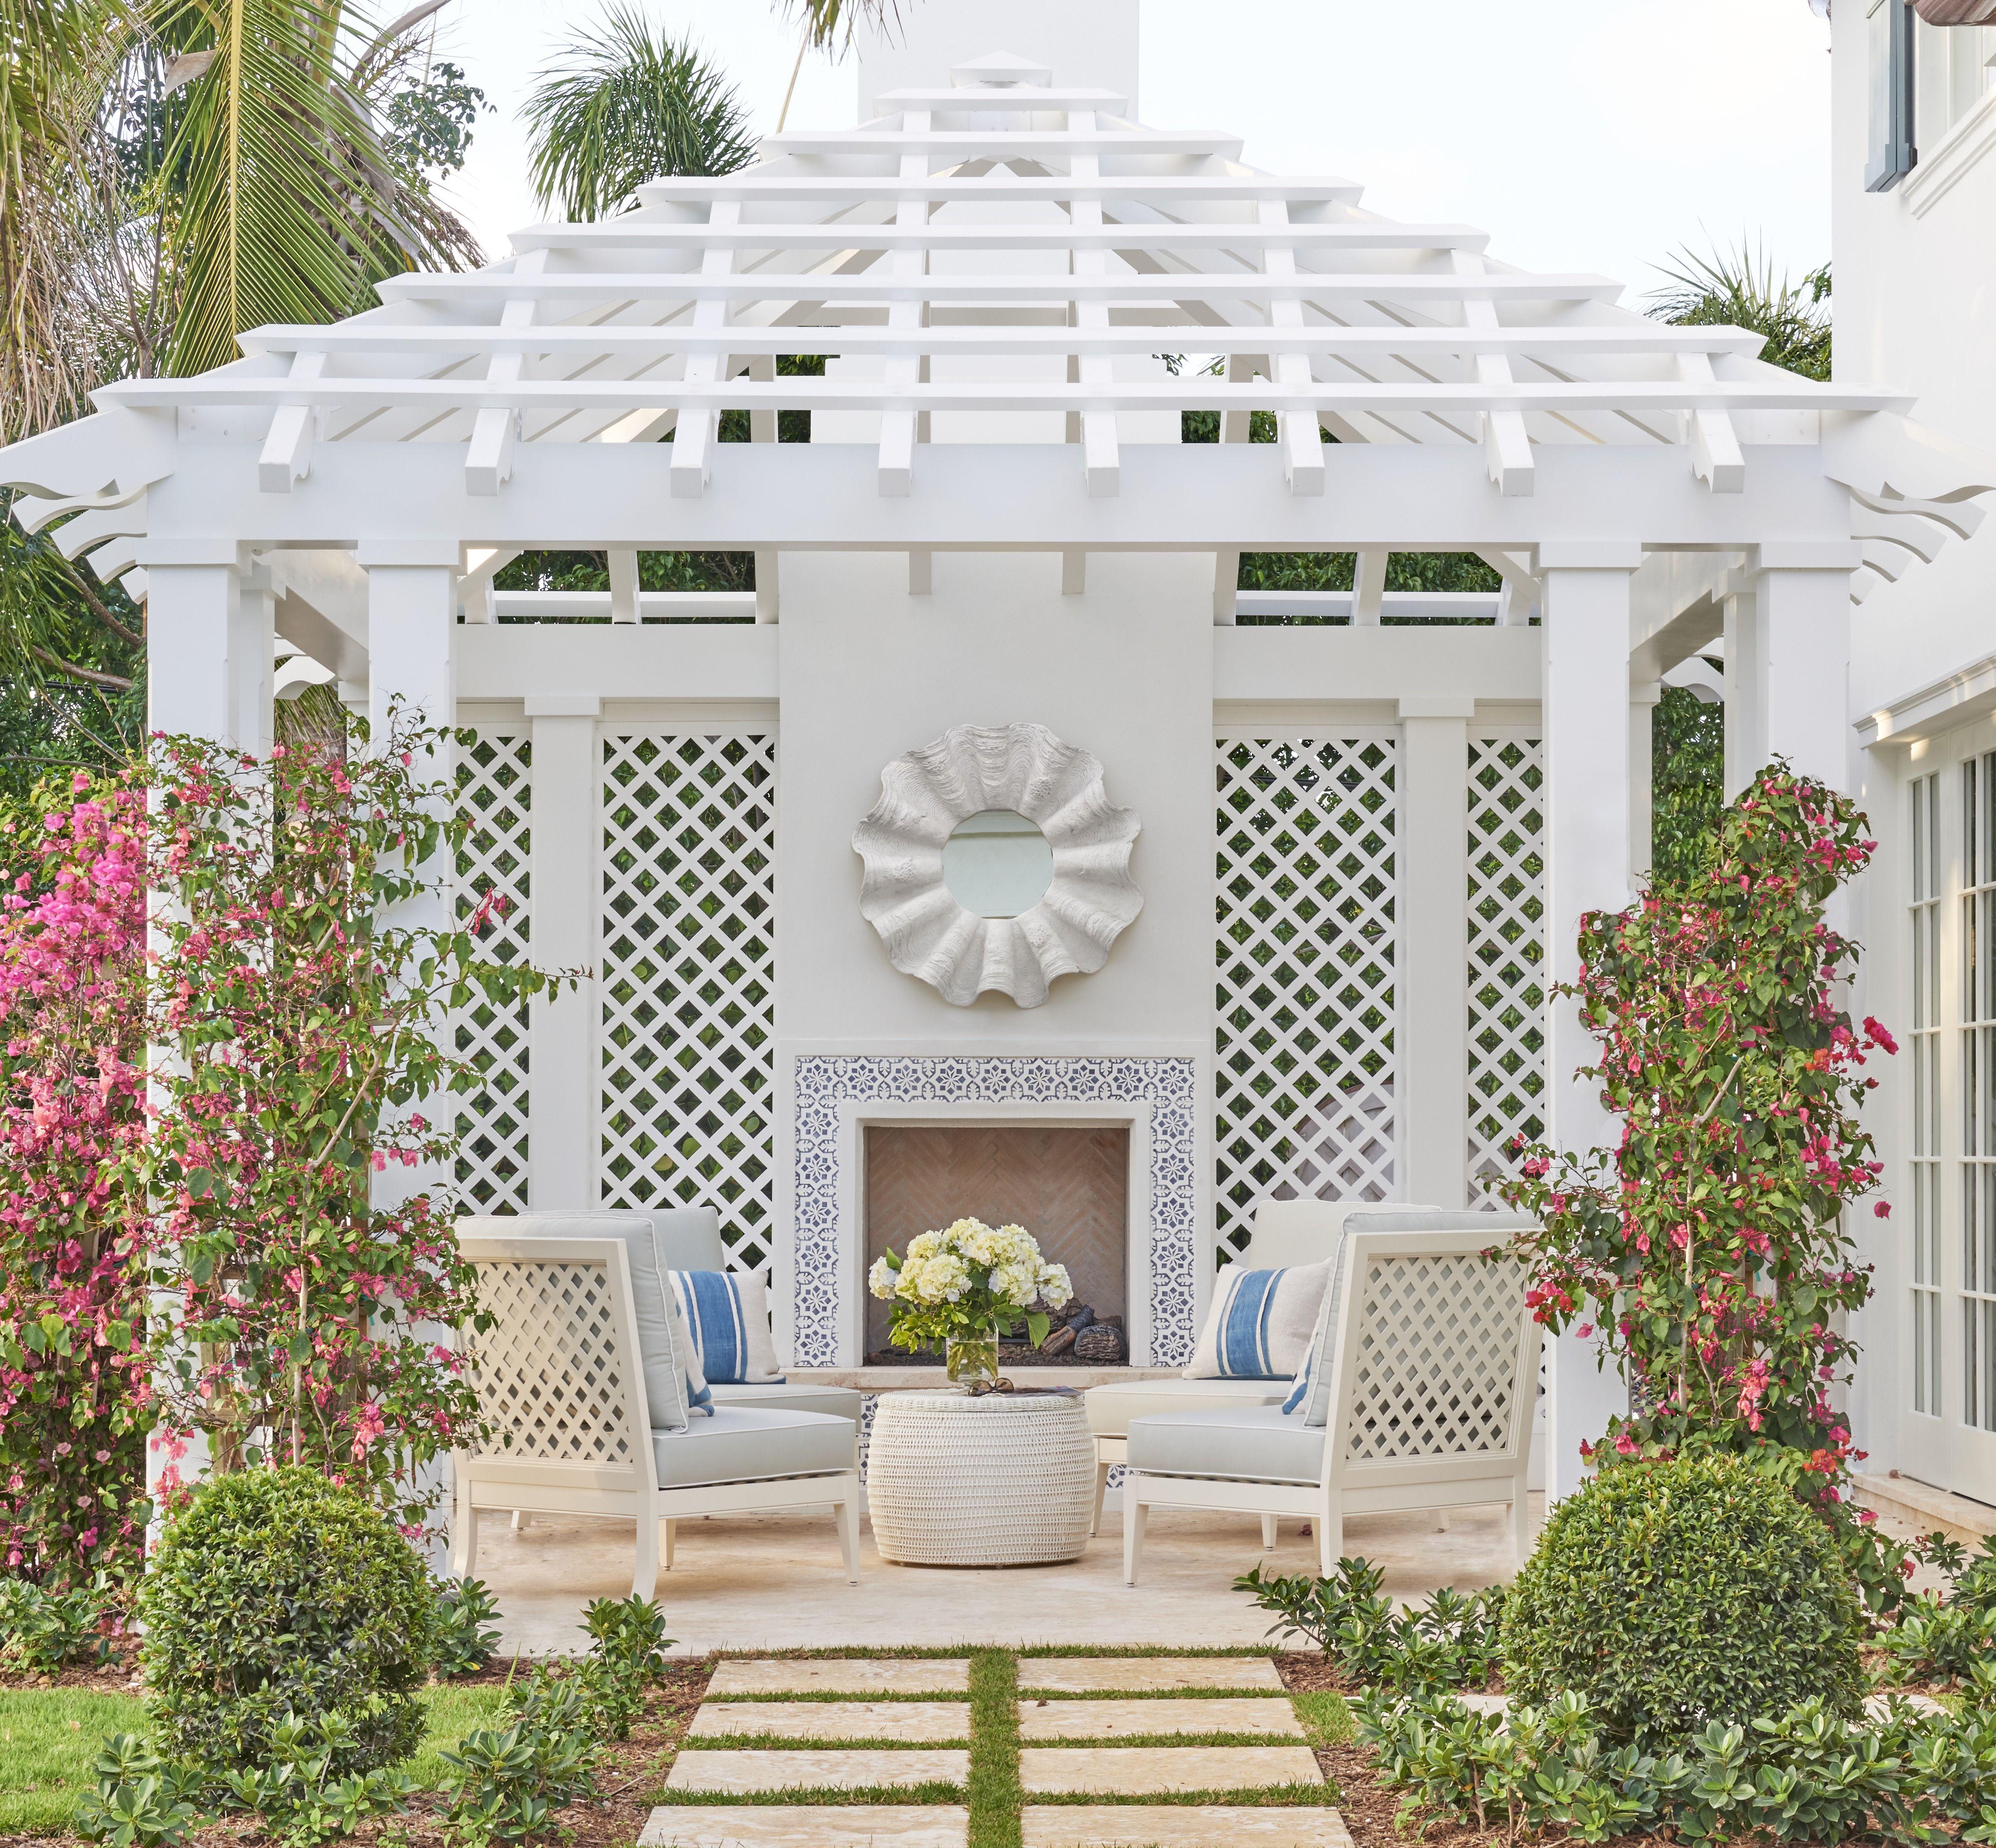 20 Patio Ideas For A Beautiful Backyard   Designer Backyard ...